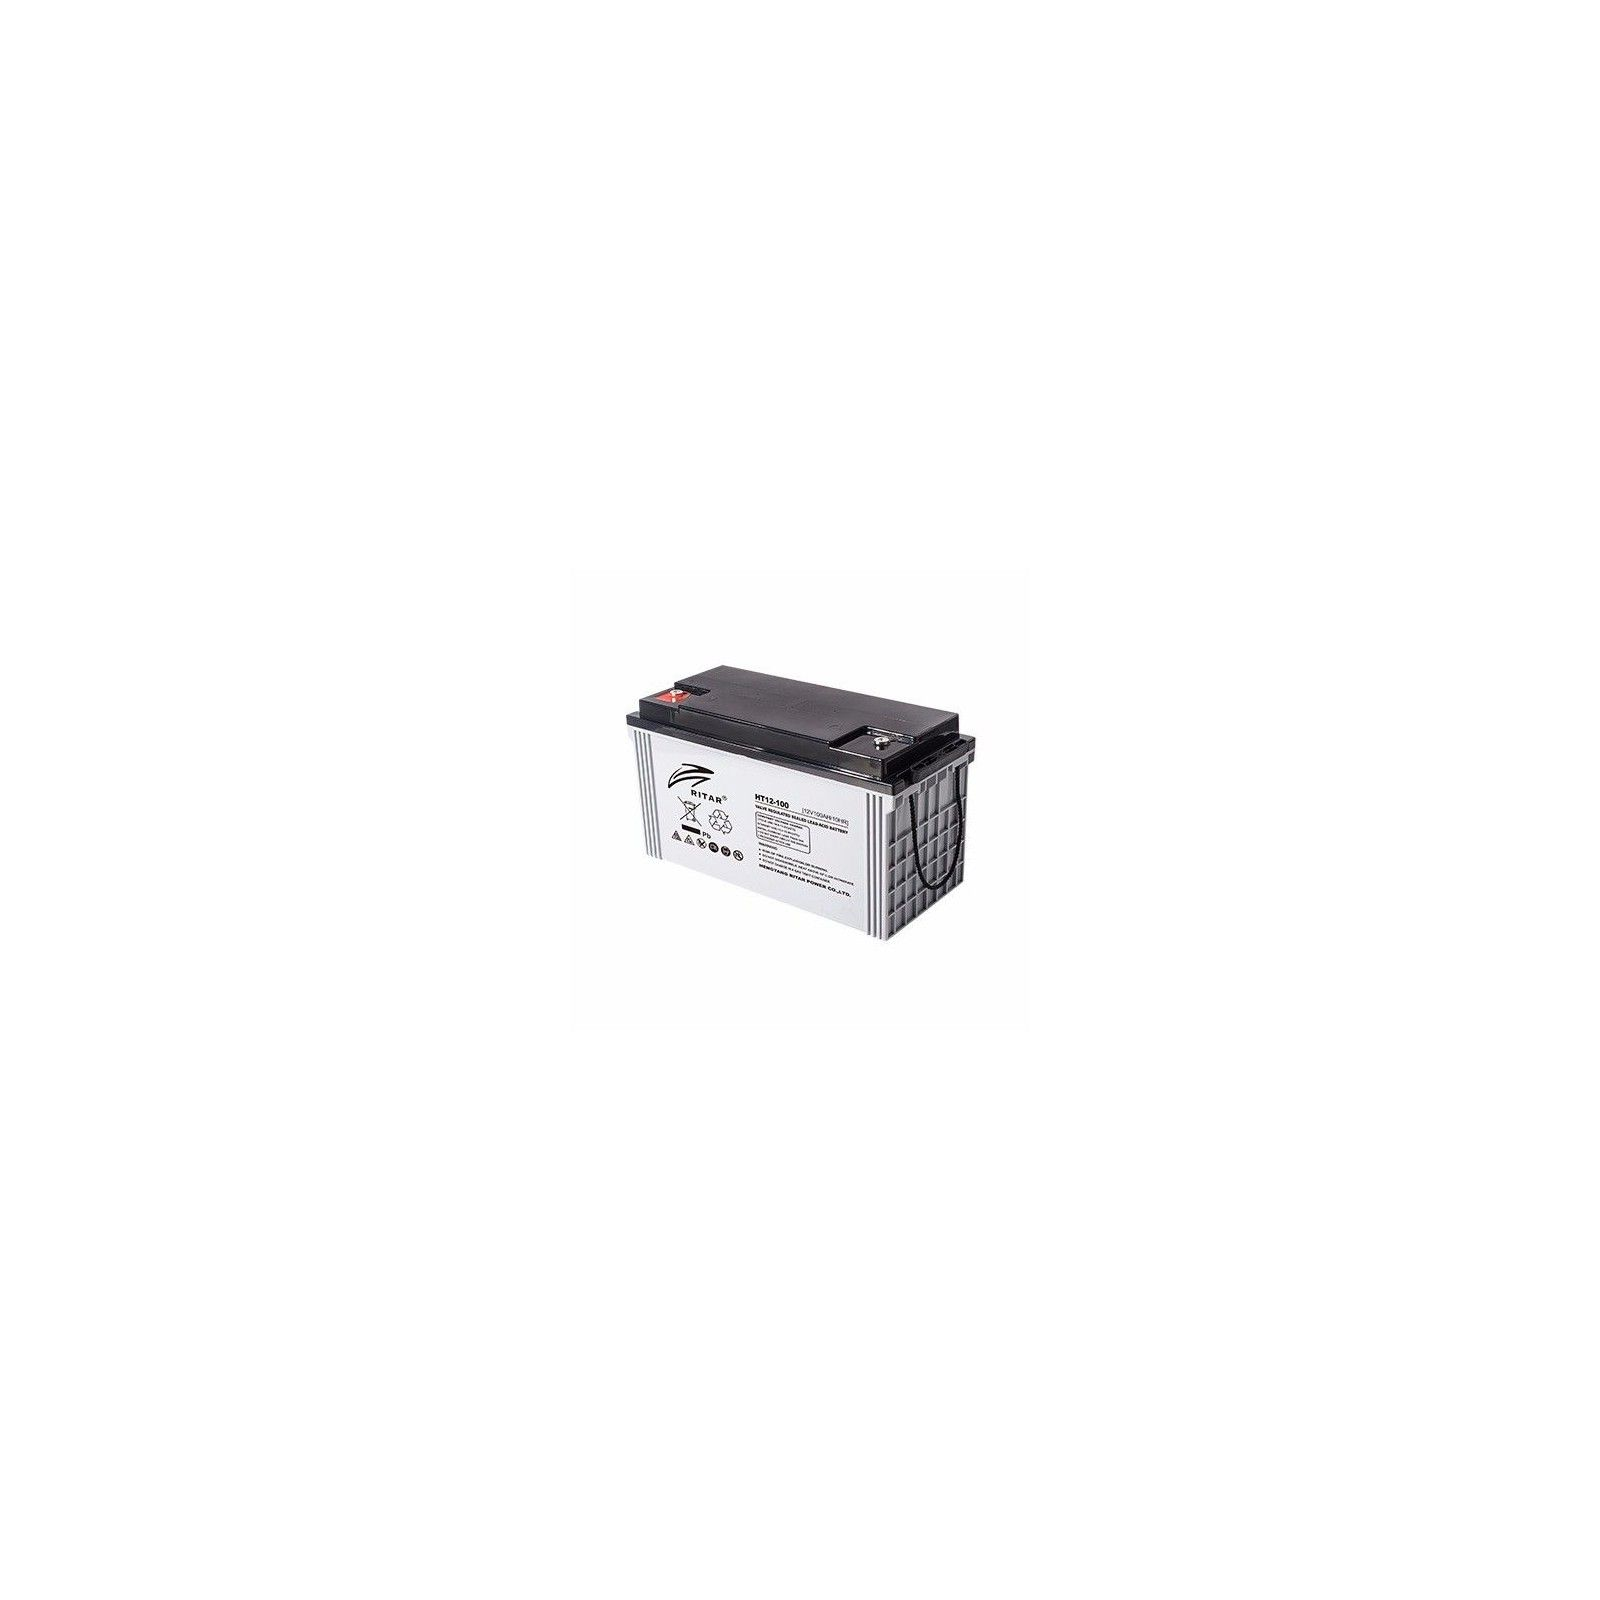 BATTERY RITAR RT645 6V 4,5AH  - 1